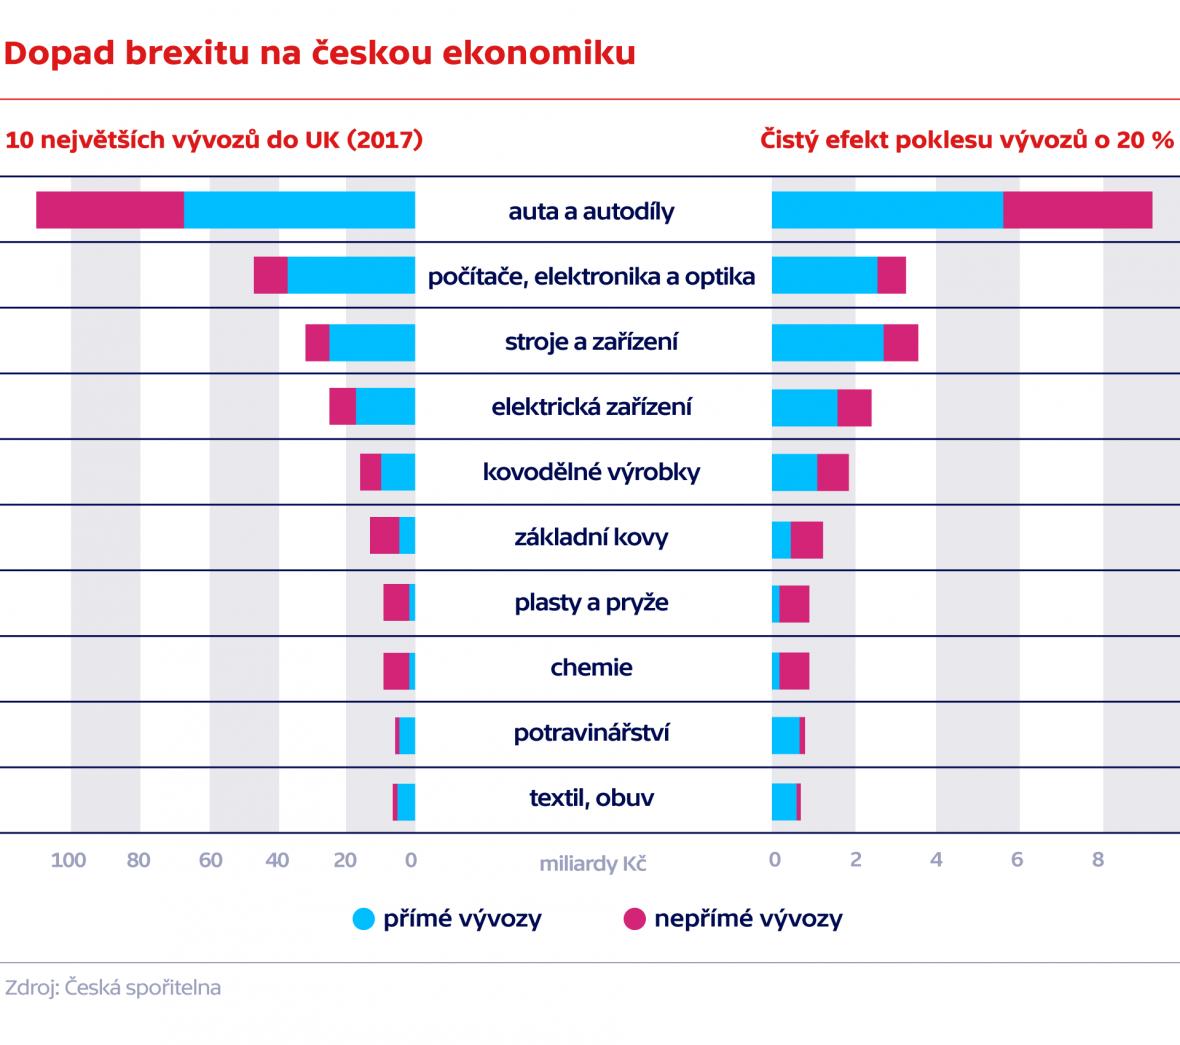 Dopad brexitu na českou ekonomiku